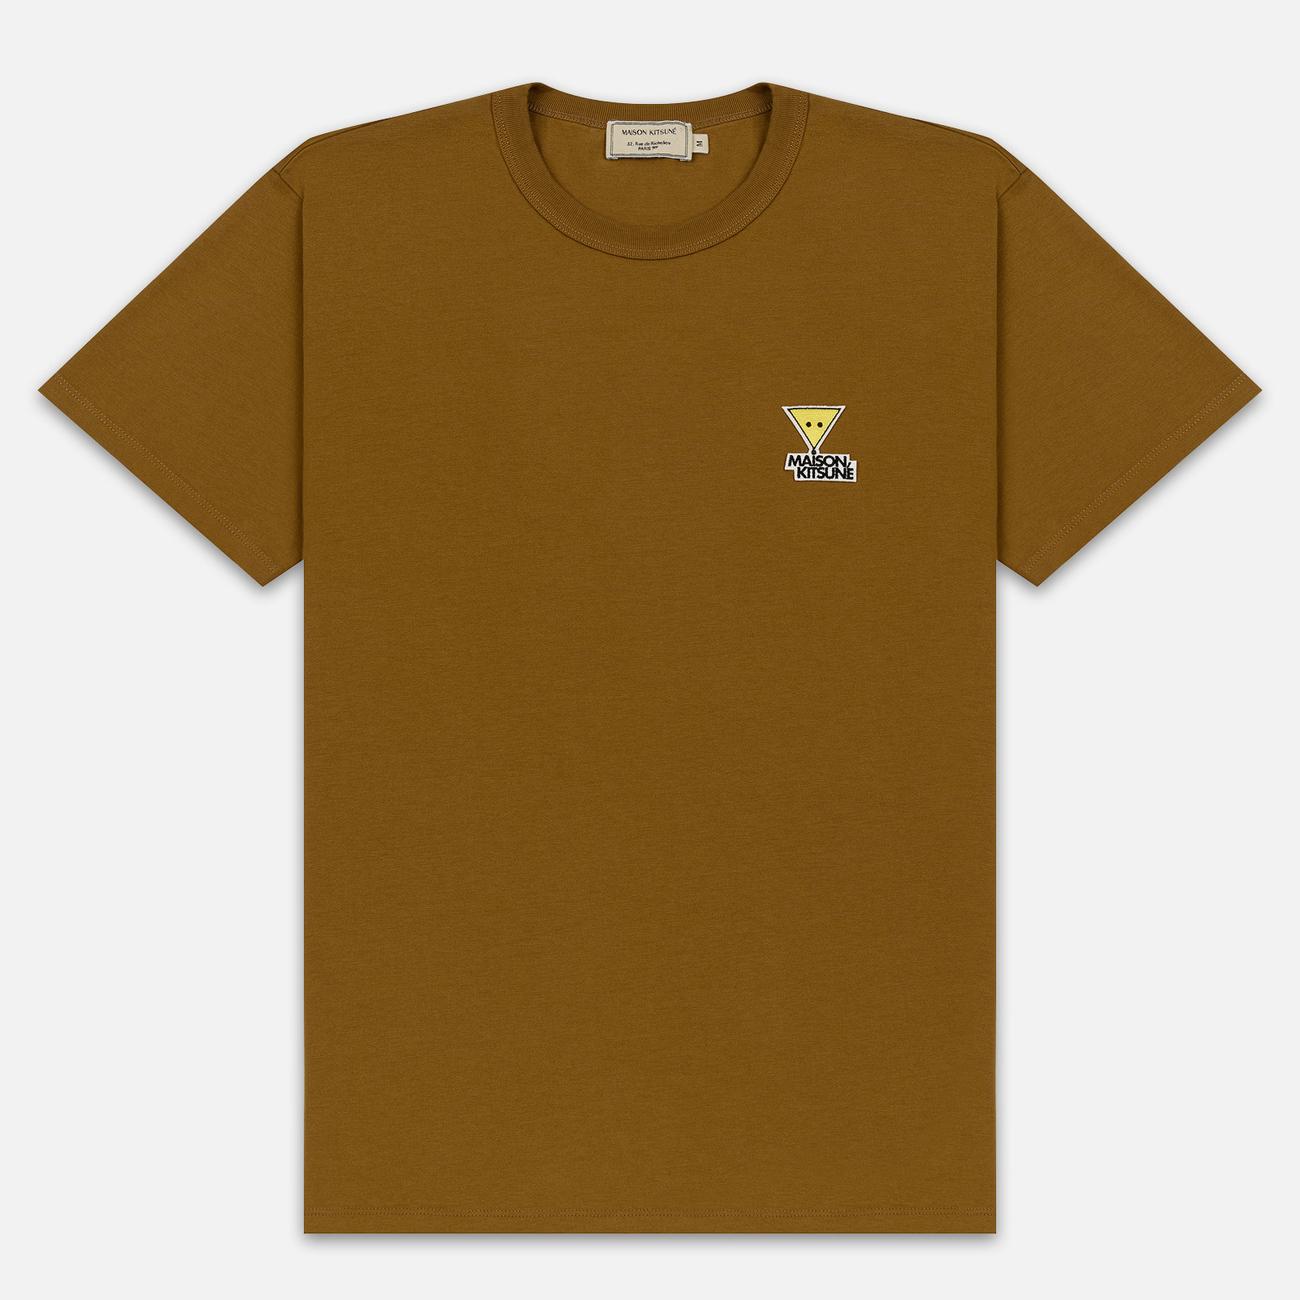 Мужская футболка Maison Kitsune Triangle Fox Patch Camel